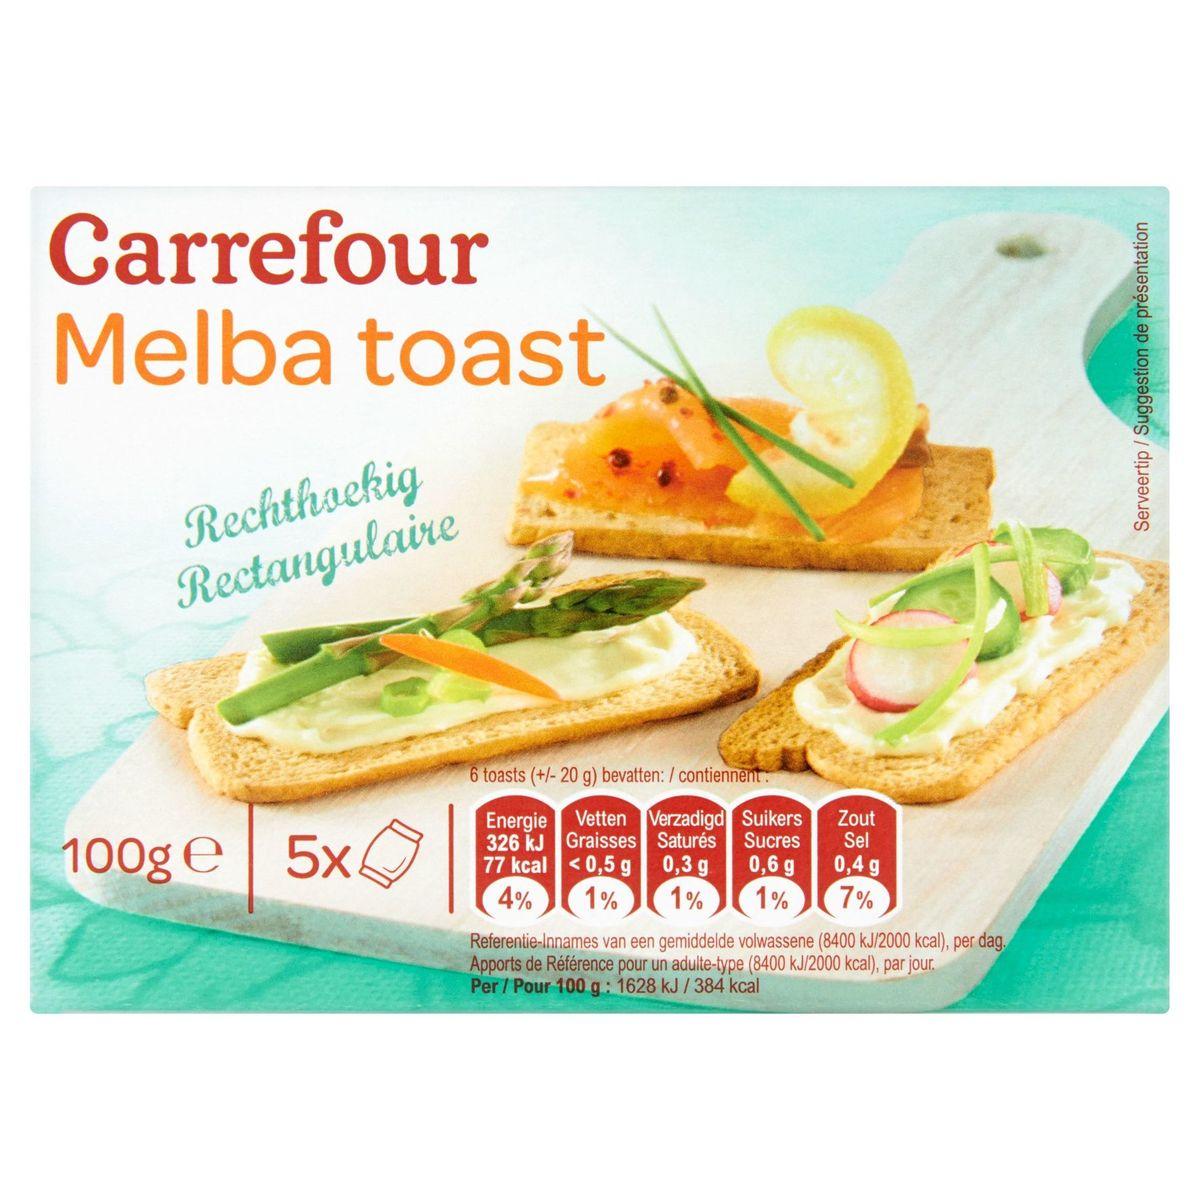 Carrefour Melba Toast Rectangulaire 5 Sachets 100 g